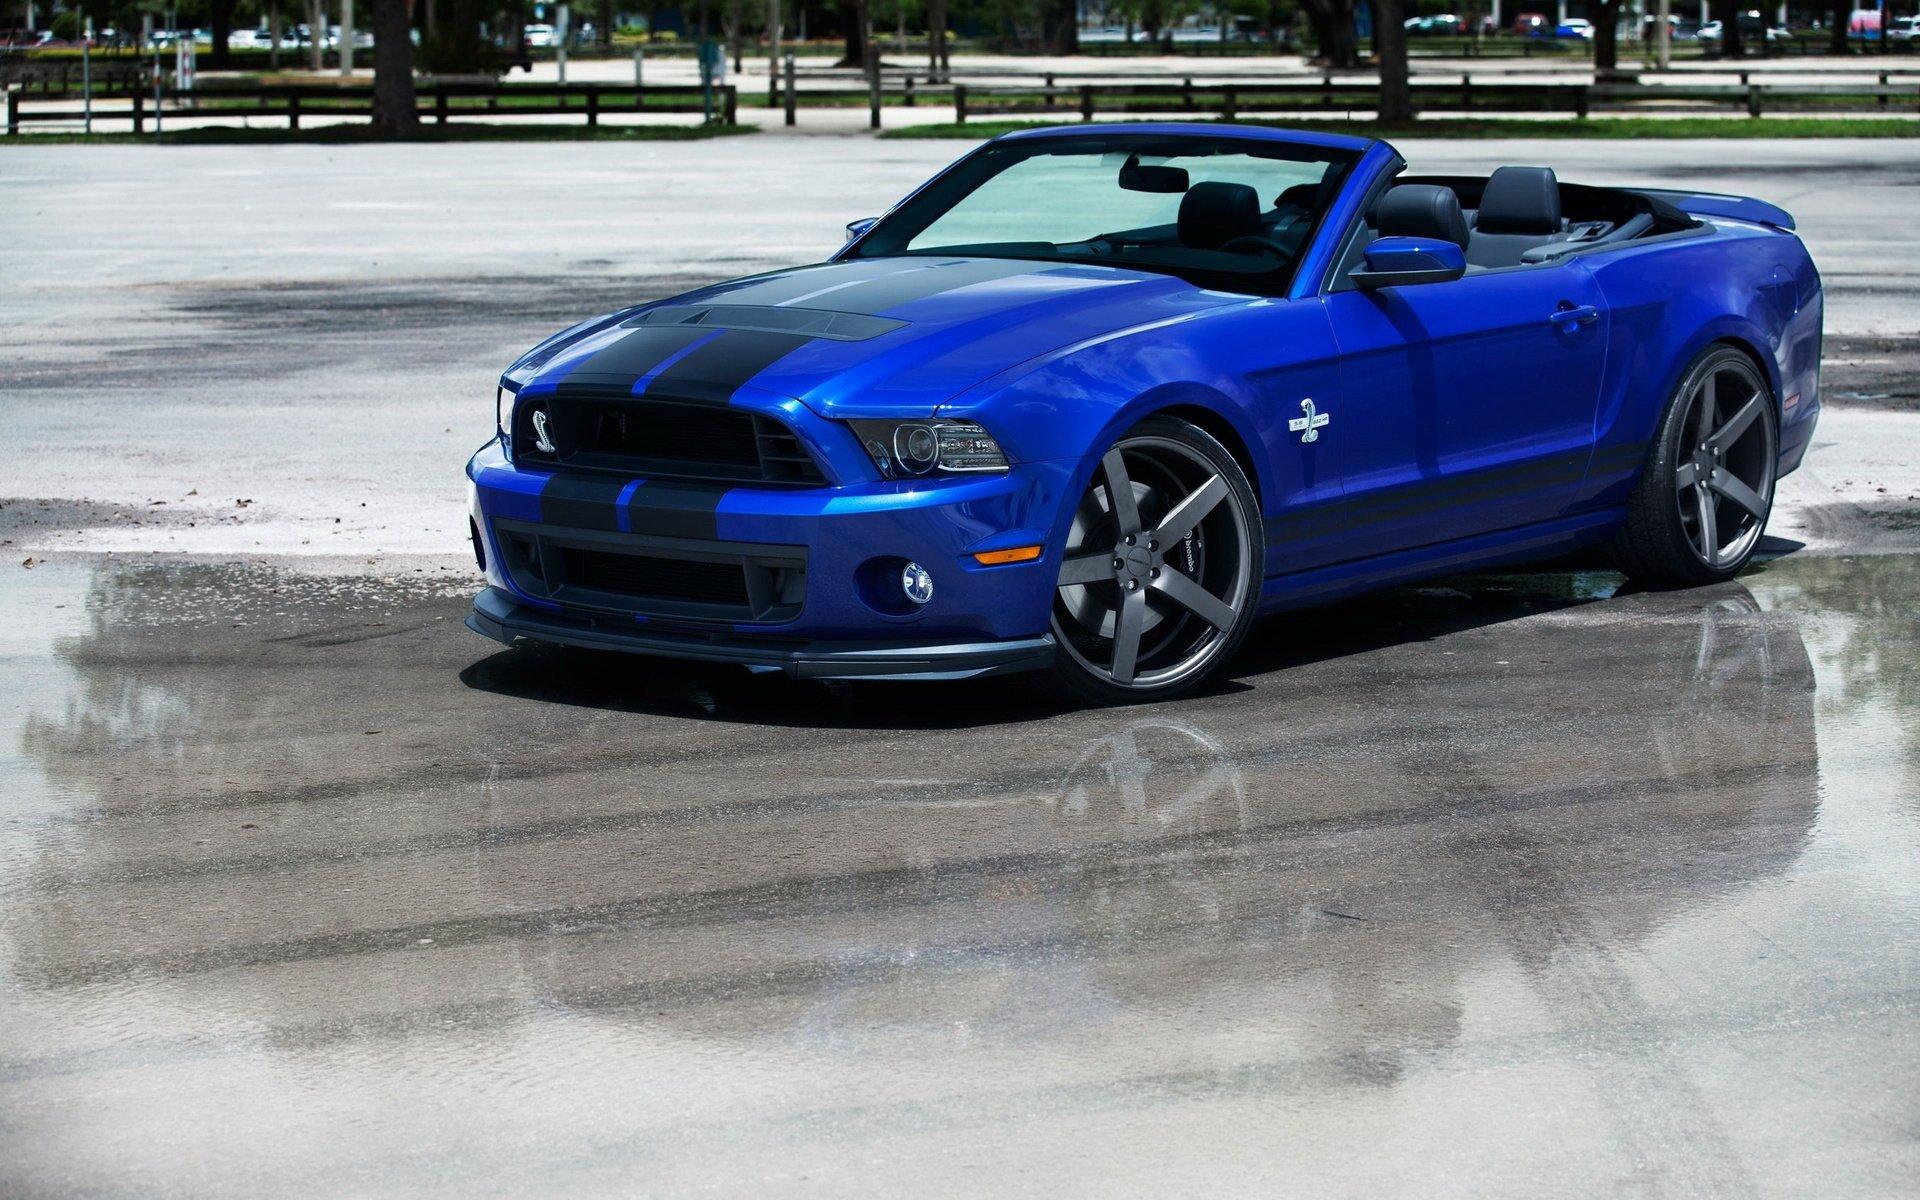 Ford Mustang Shelby Cobra Gt 500 Fond D 233 Cran Hd Arri 232 Re